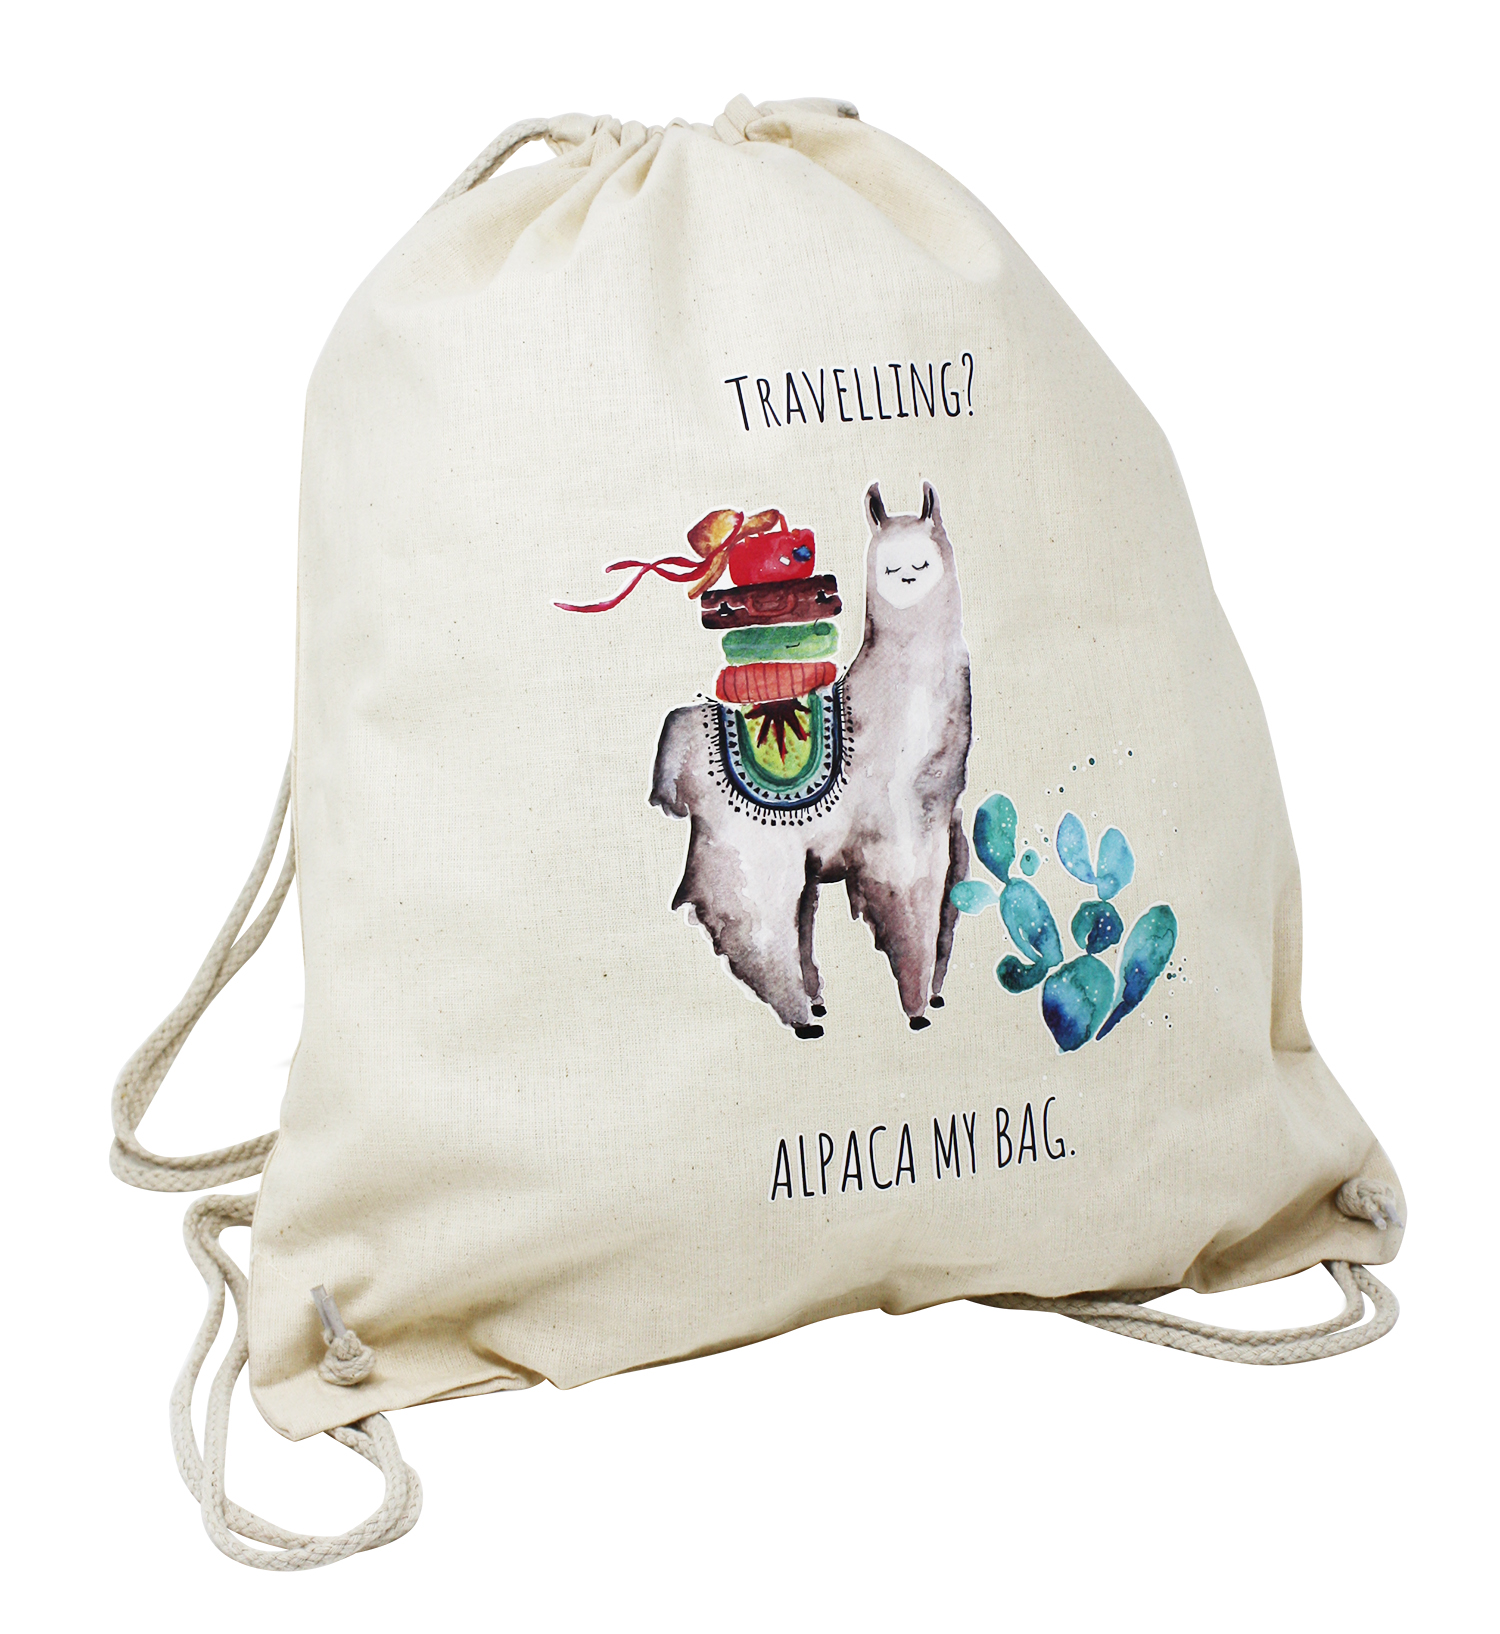 3a7ad1a4fba71 Alpaka Turnbeutel Alpaca My Bag - Reisen Hipster Beutel Jutebeutel ...